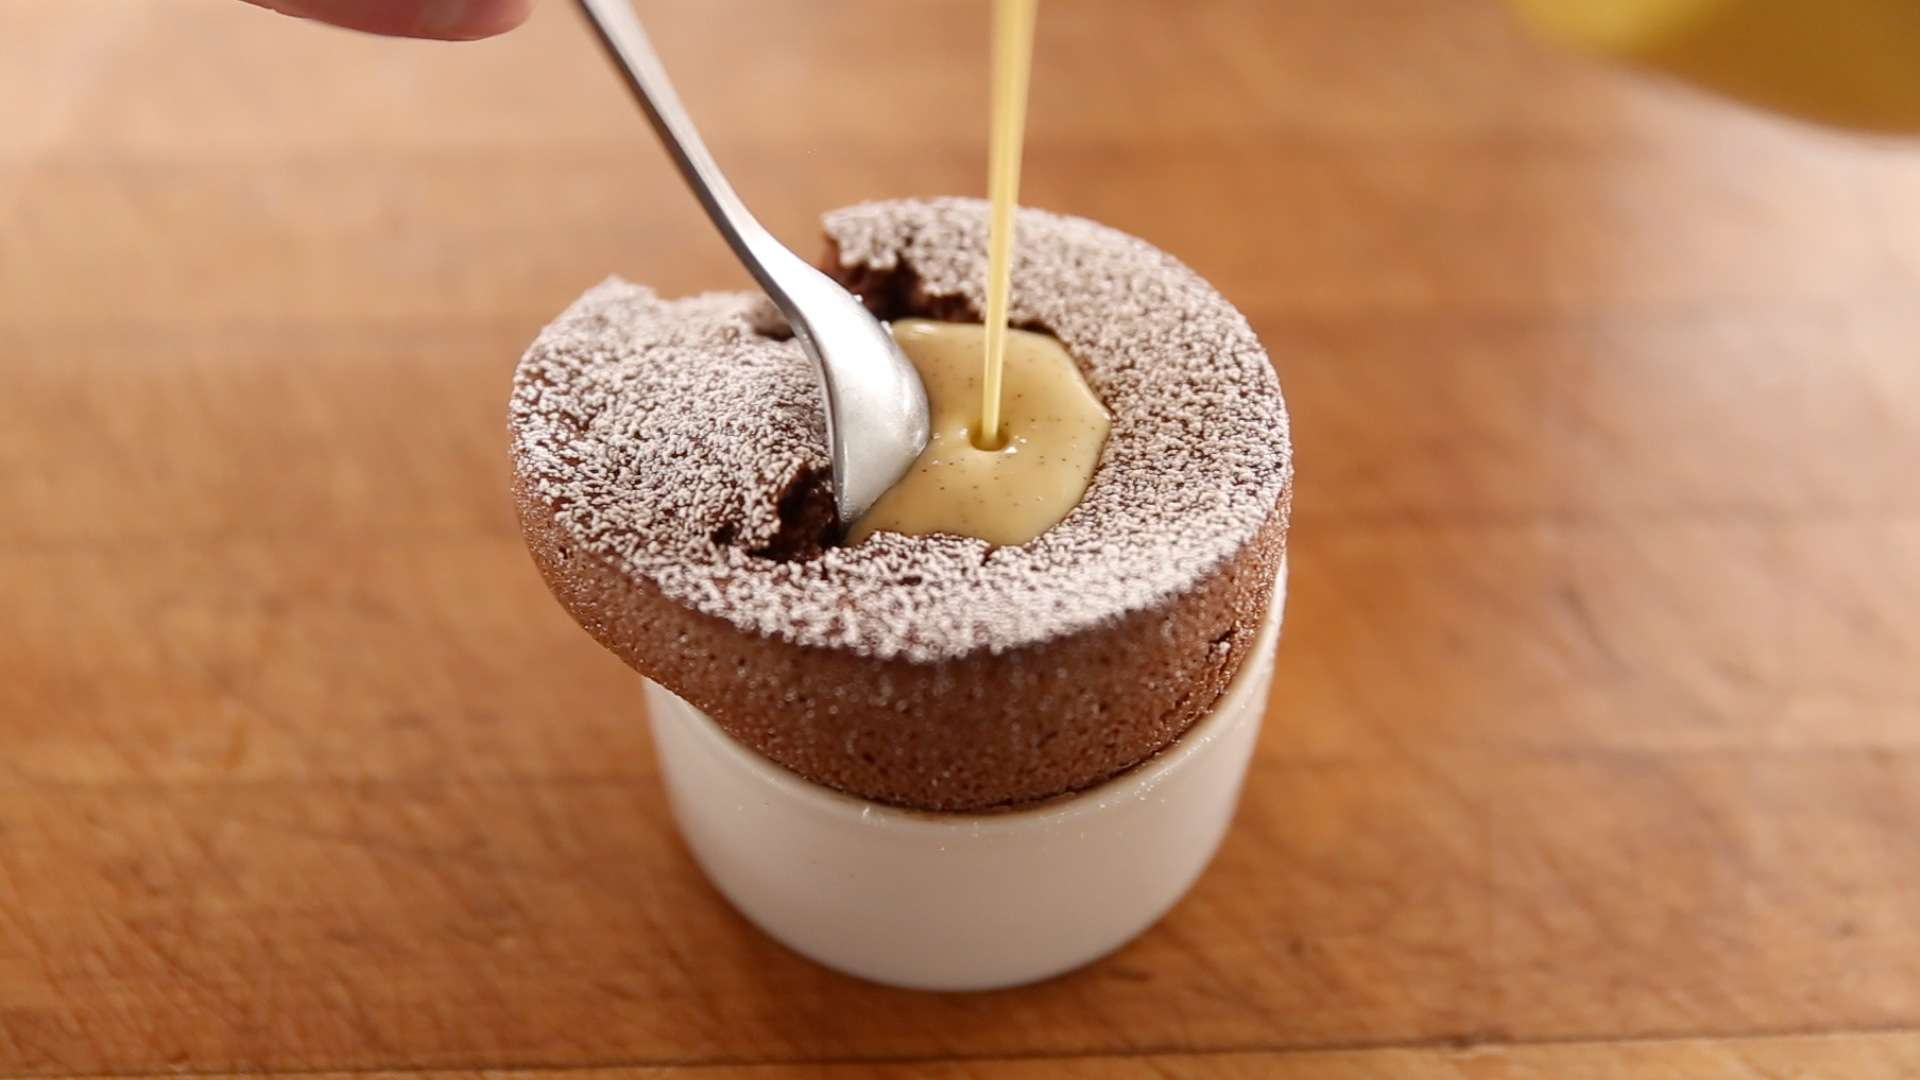 How To Make Molten Chocolate Soufflé - Food Republic